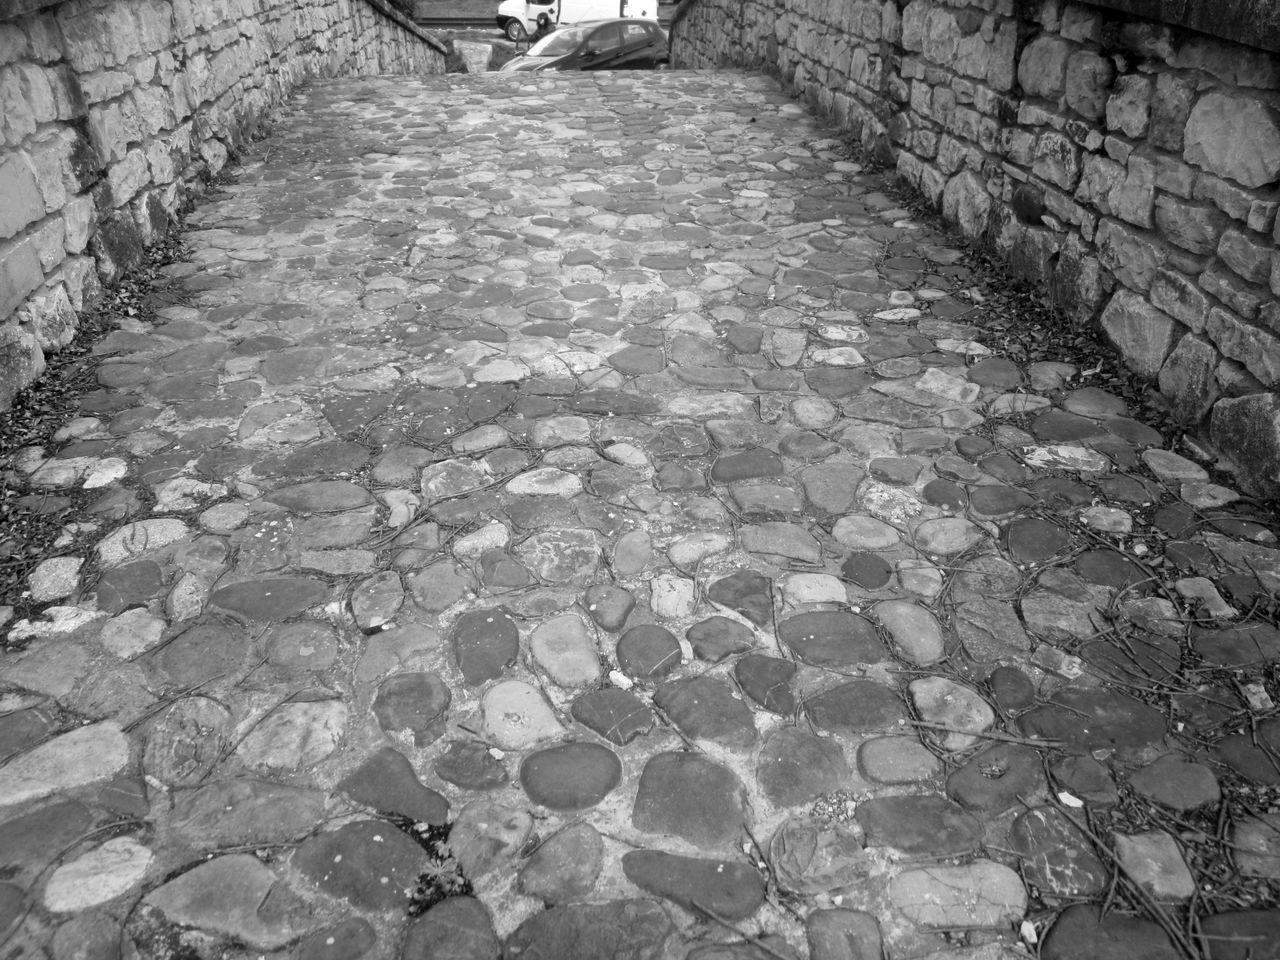 #basilicata #Black&White #blackandwhite #fotobiancoenero #fotobianconero #Italia #italy #lucania #OldPicture #potenza #potenzainferiore #vialedelbasento